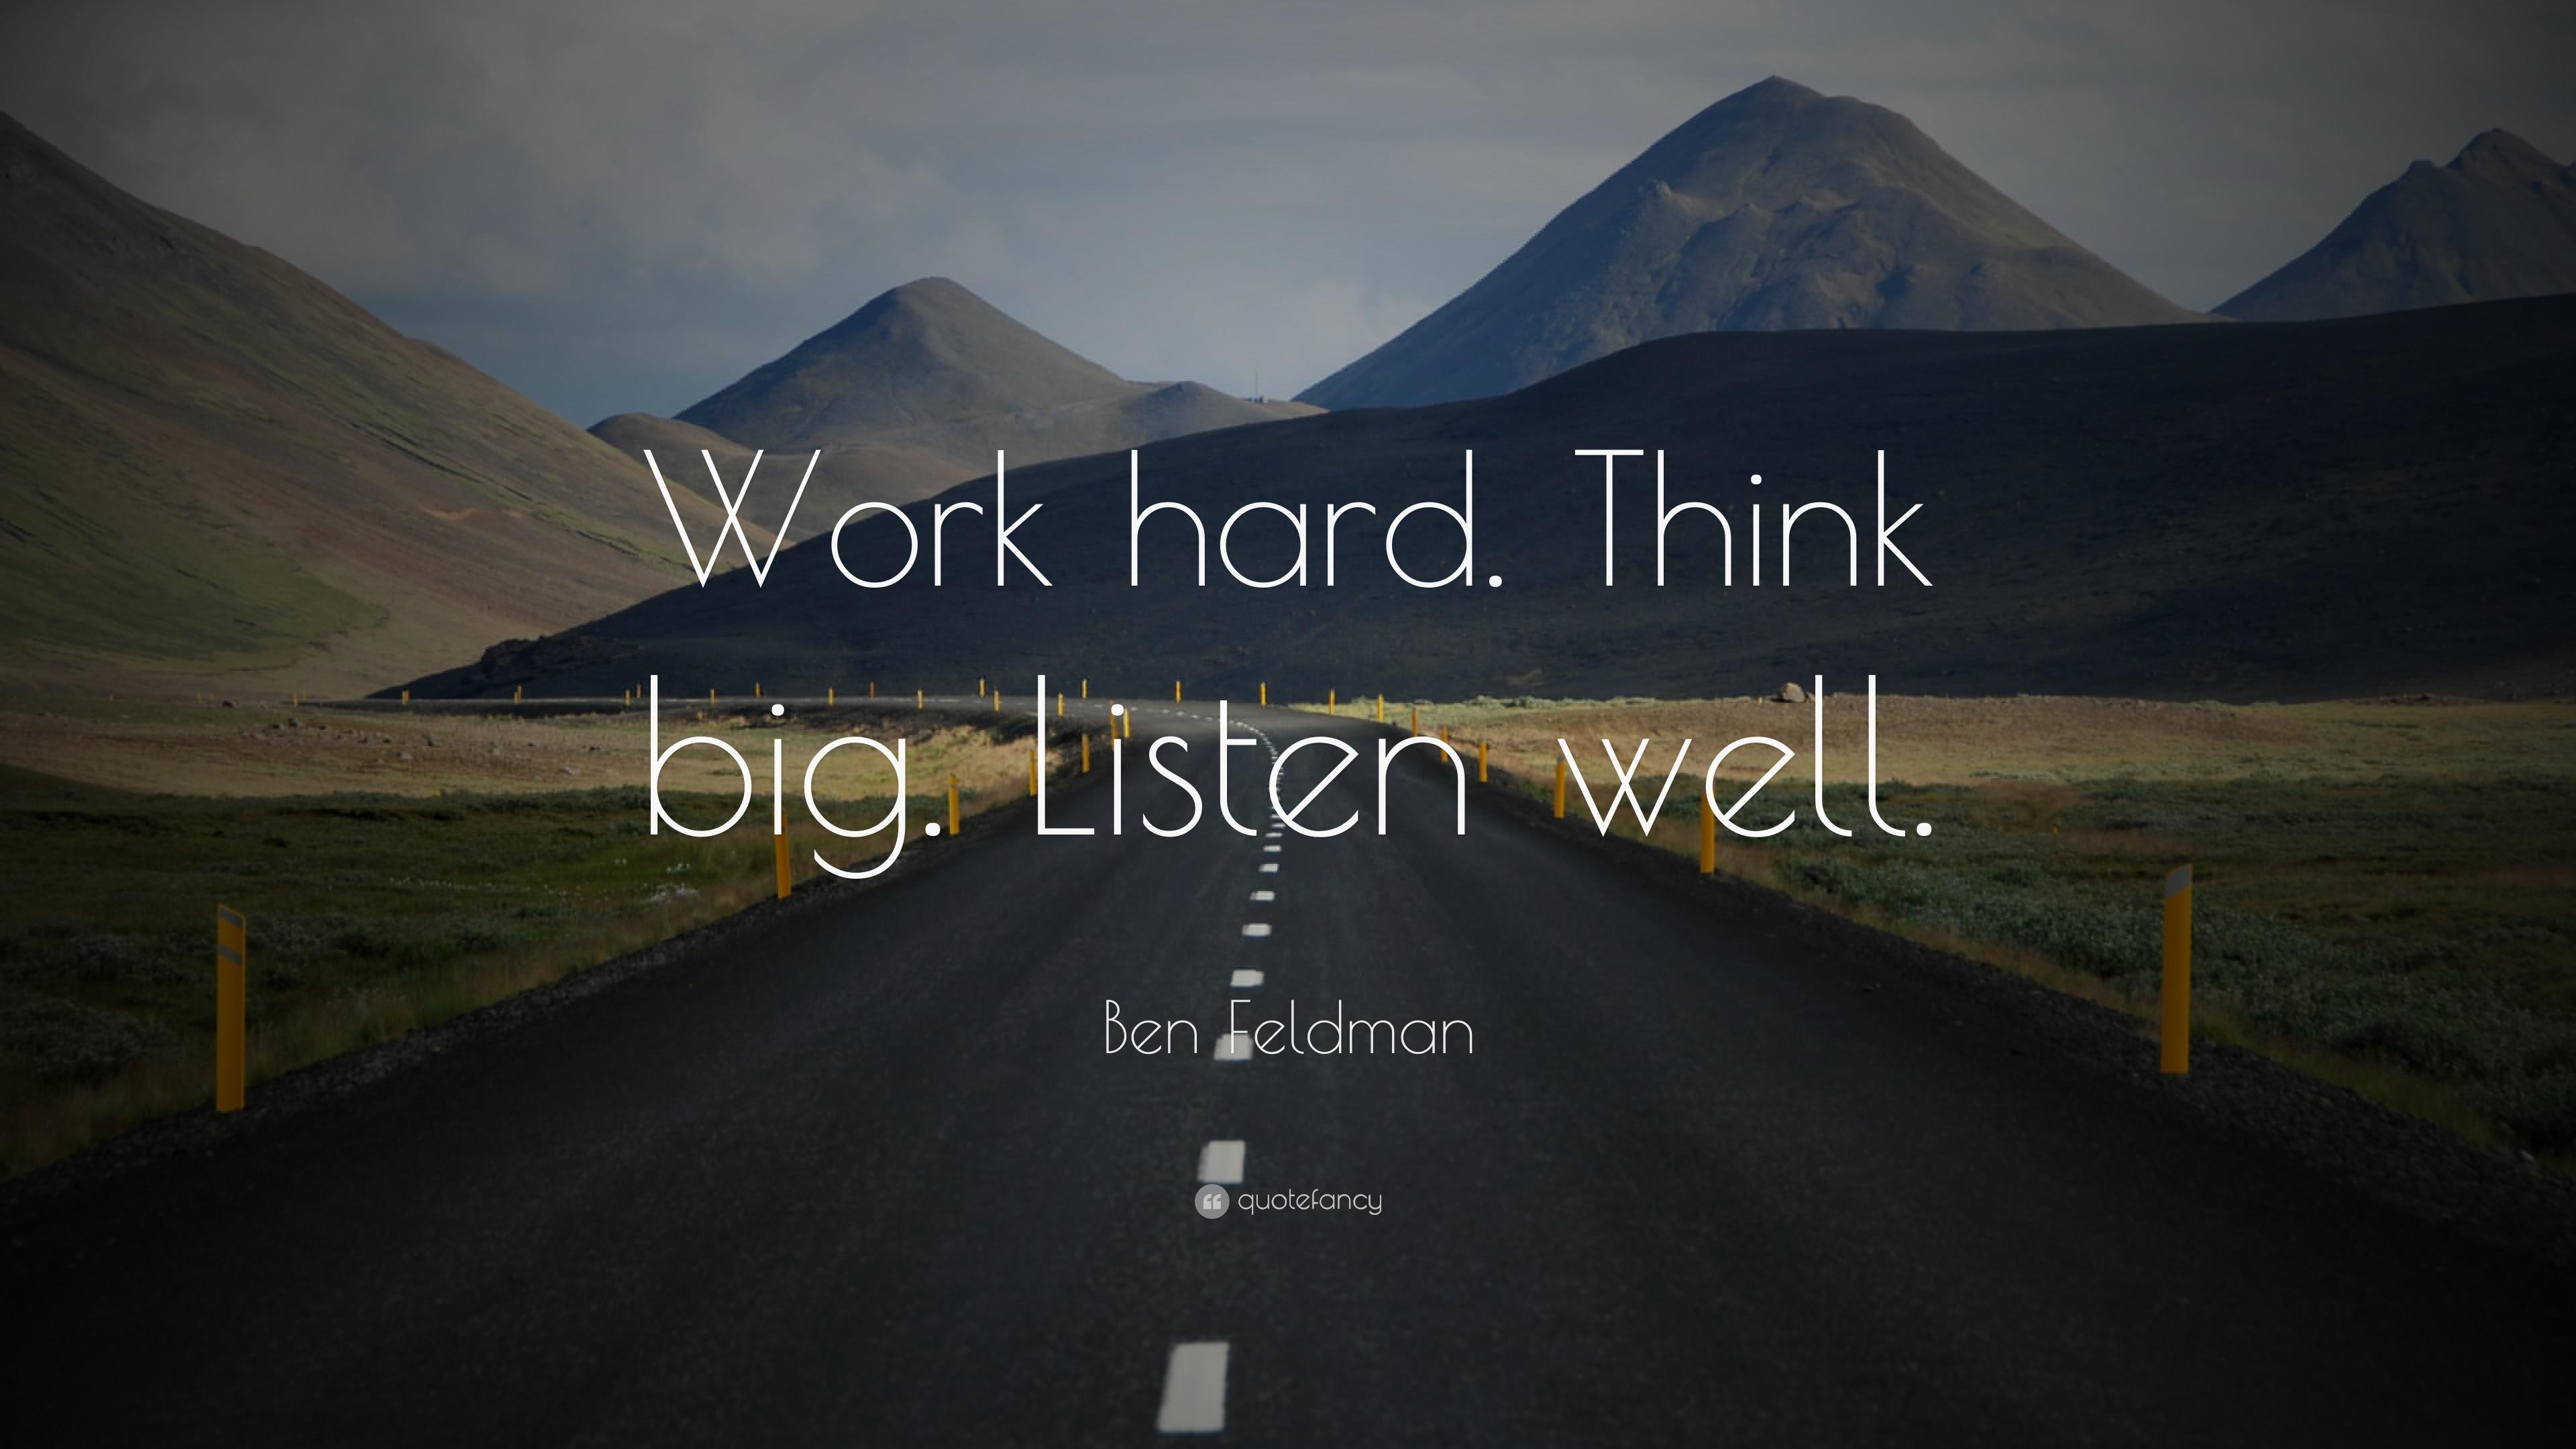 Swami Vivekananda Quotes Wallpaper Ben Feldman Quote Work Hard Think Big Listen Well